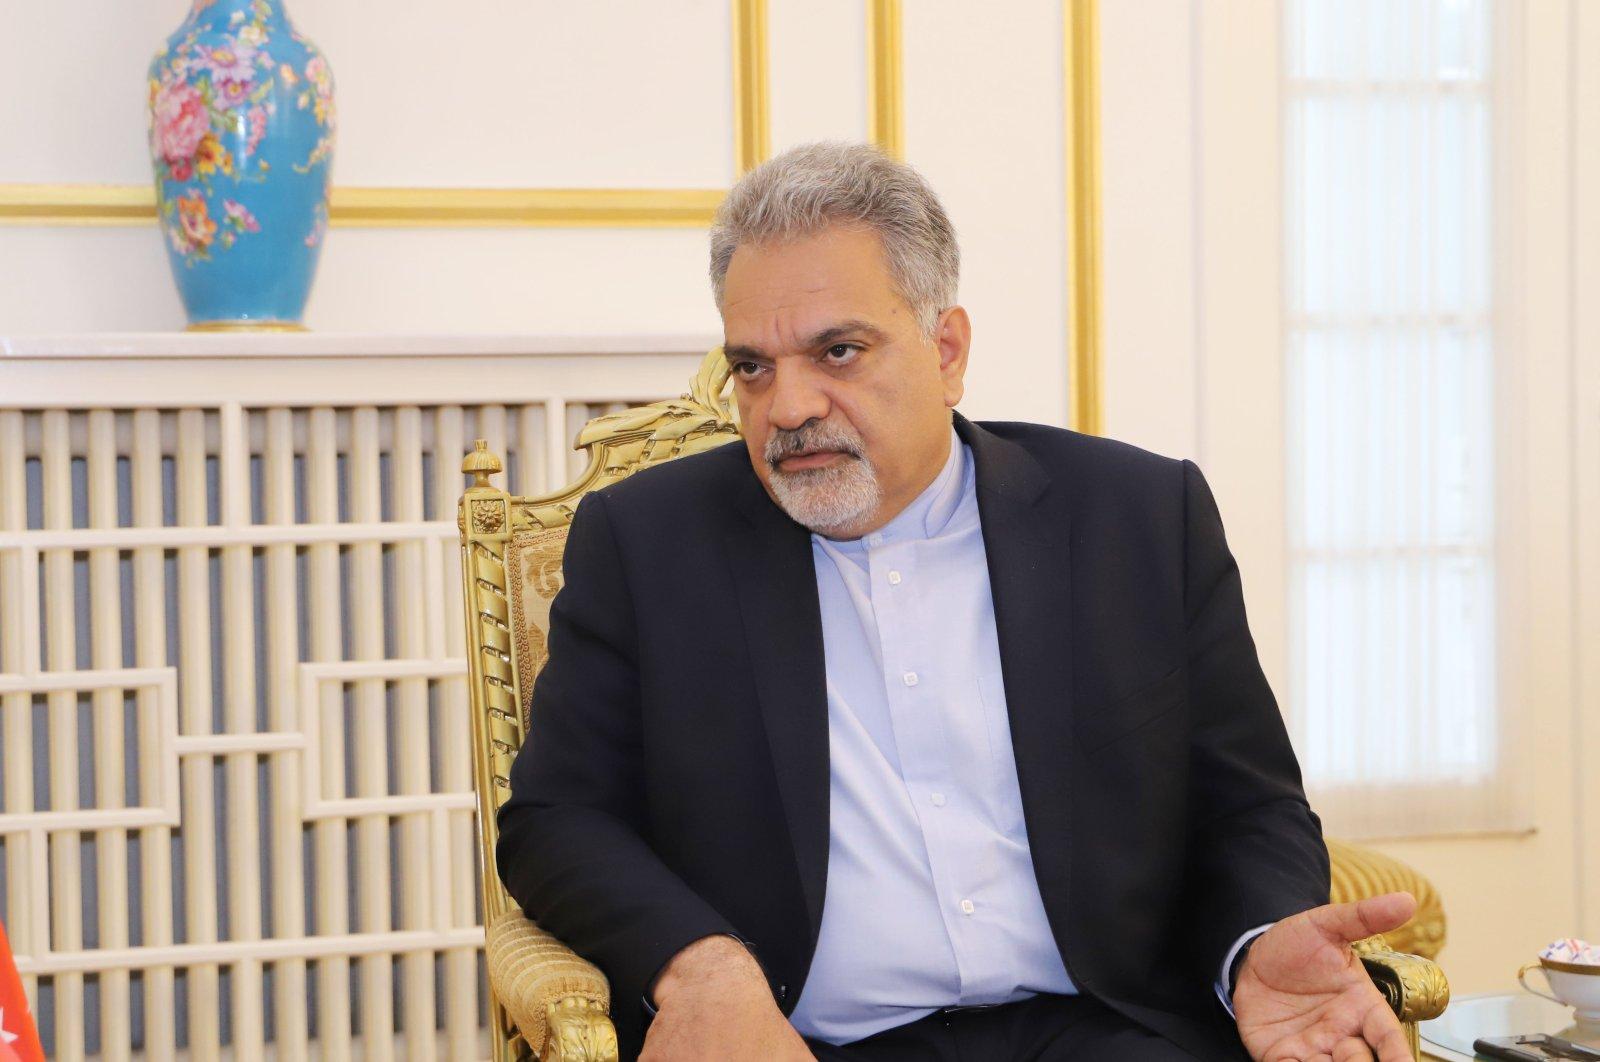 Iranian Ambassador to Turkey Mohammad Farazmand during an interview with Daily Sabah in Ankara, May 4, 2019.